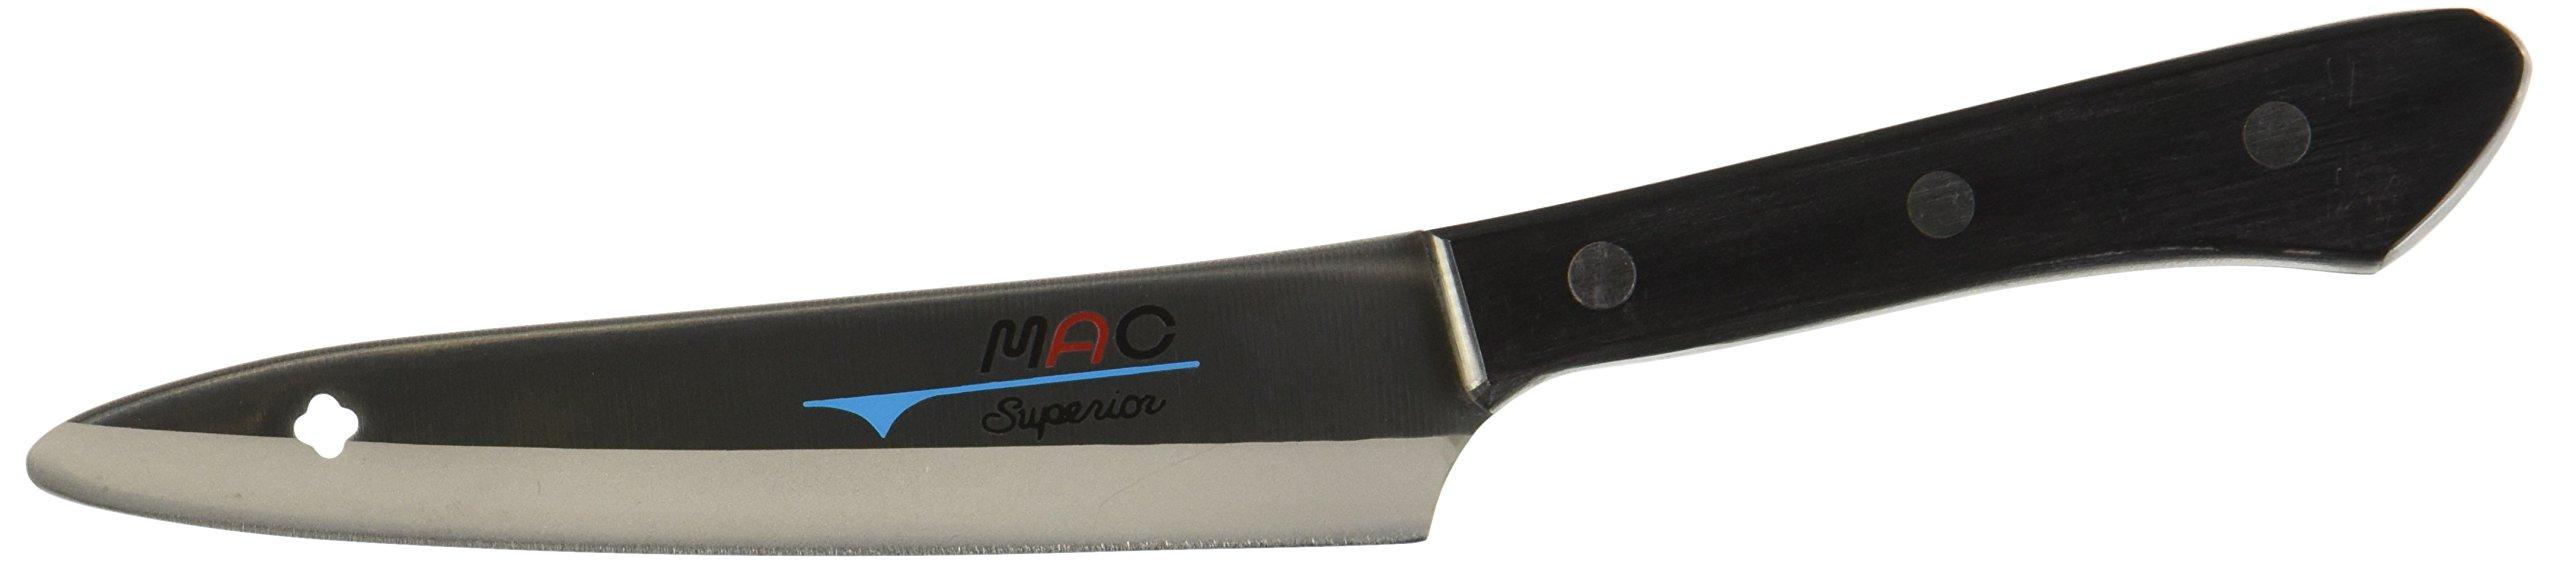 Mac Knife Superior Paring/Utility Knife, 5-Inch